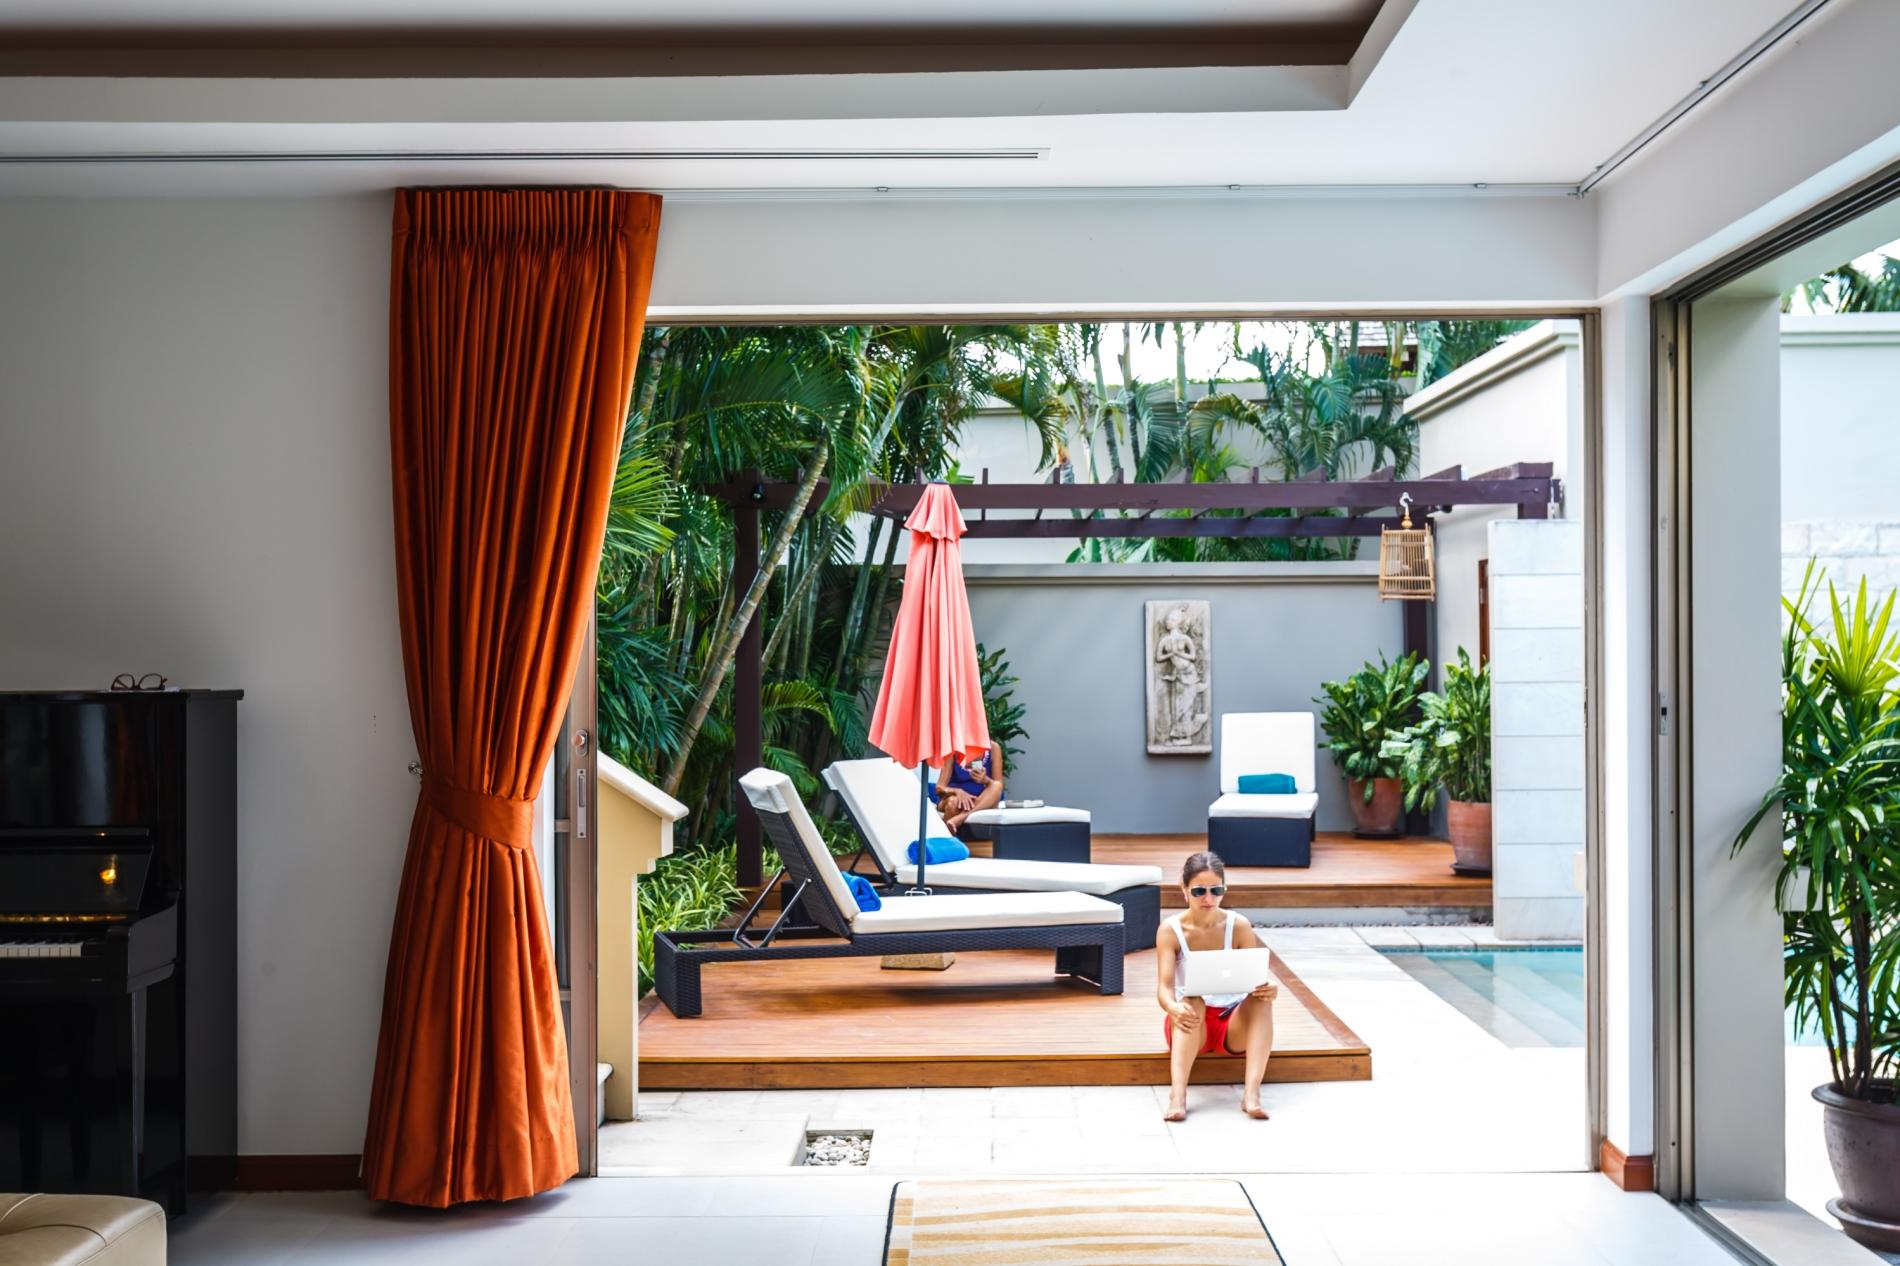 TR105 - Private pool 3 bedroom villa in Bang Tao Residence photo 5694538